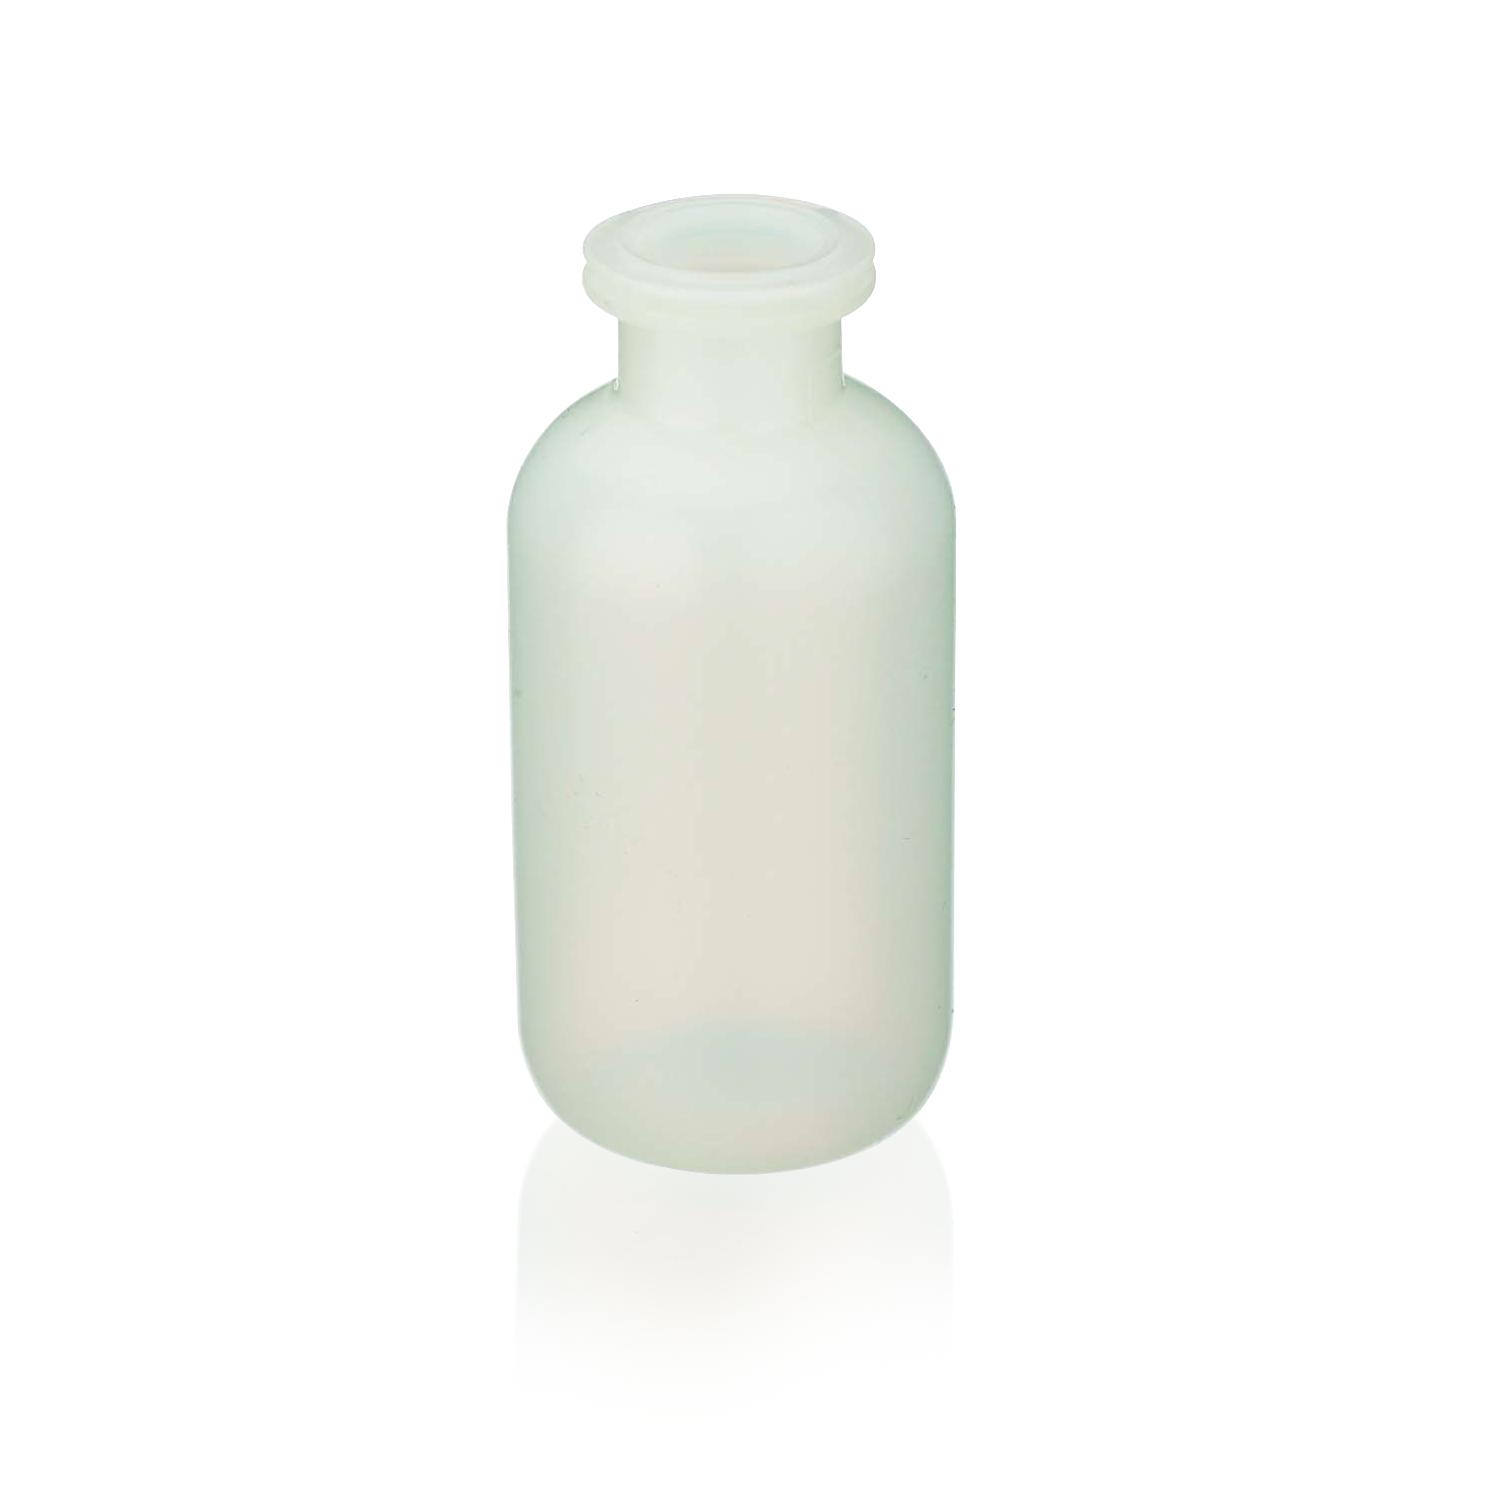 WHEATON® HDPE Serum Bottle, 60 mL